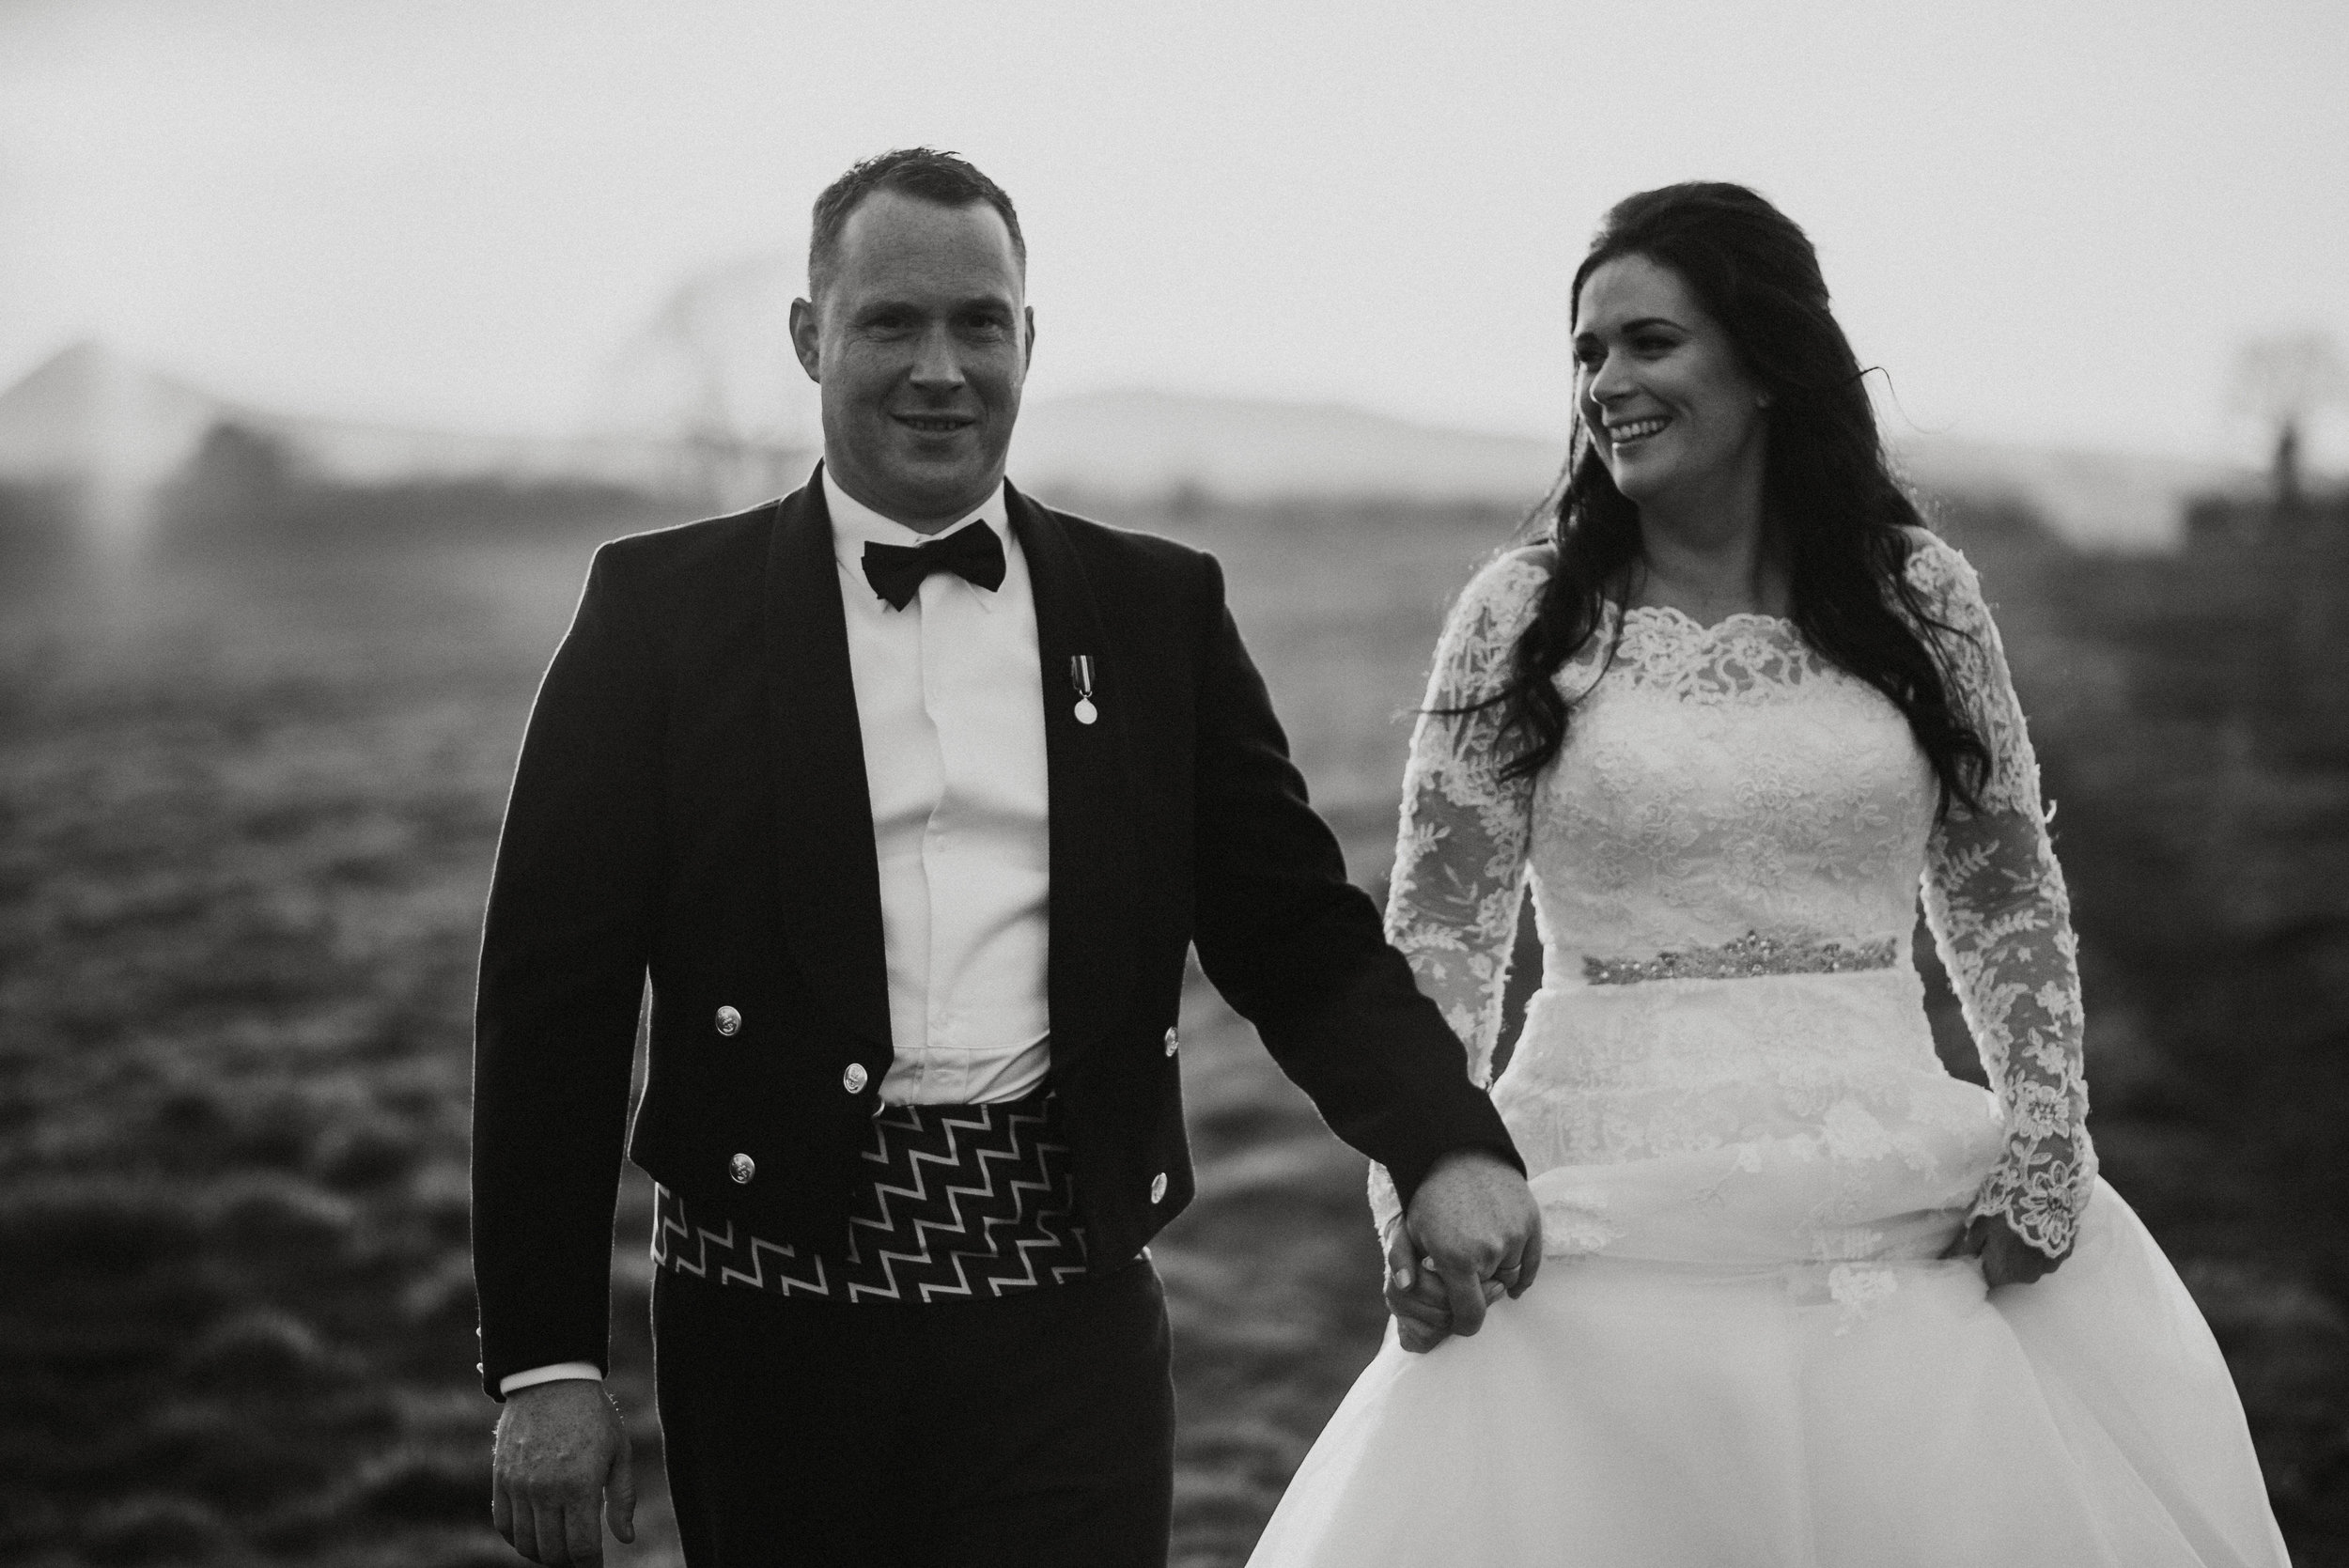 wedding-photographer-the-green-cornwall-22.jpg